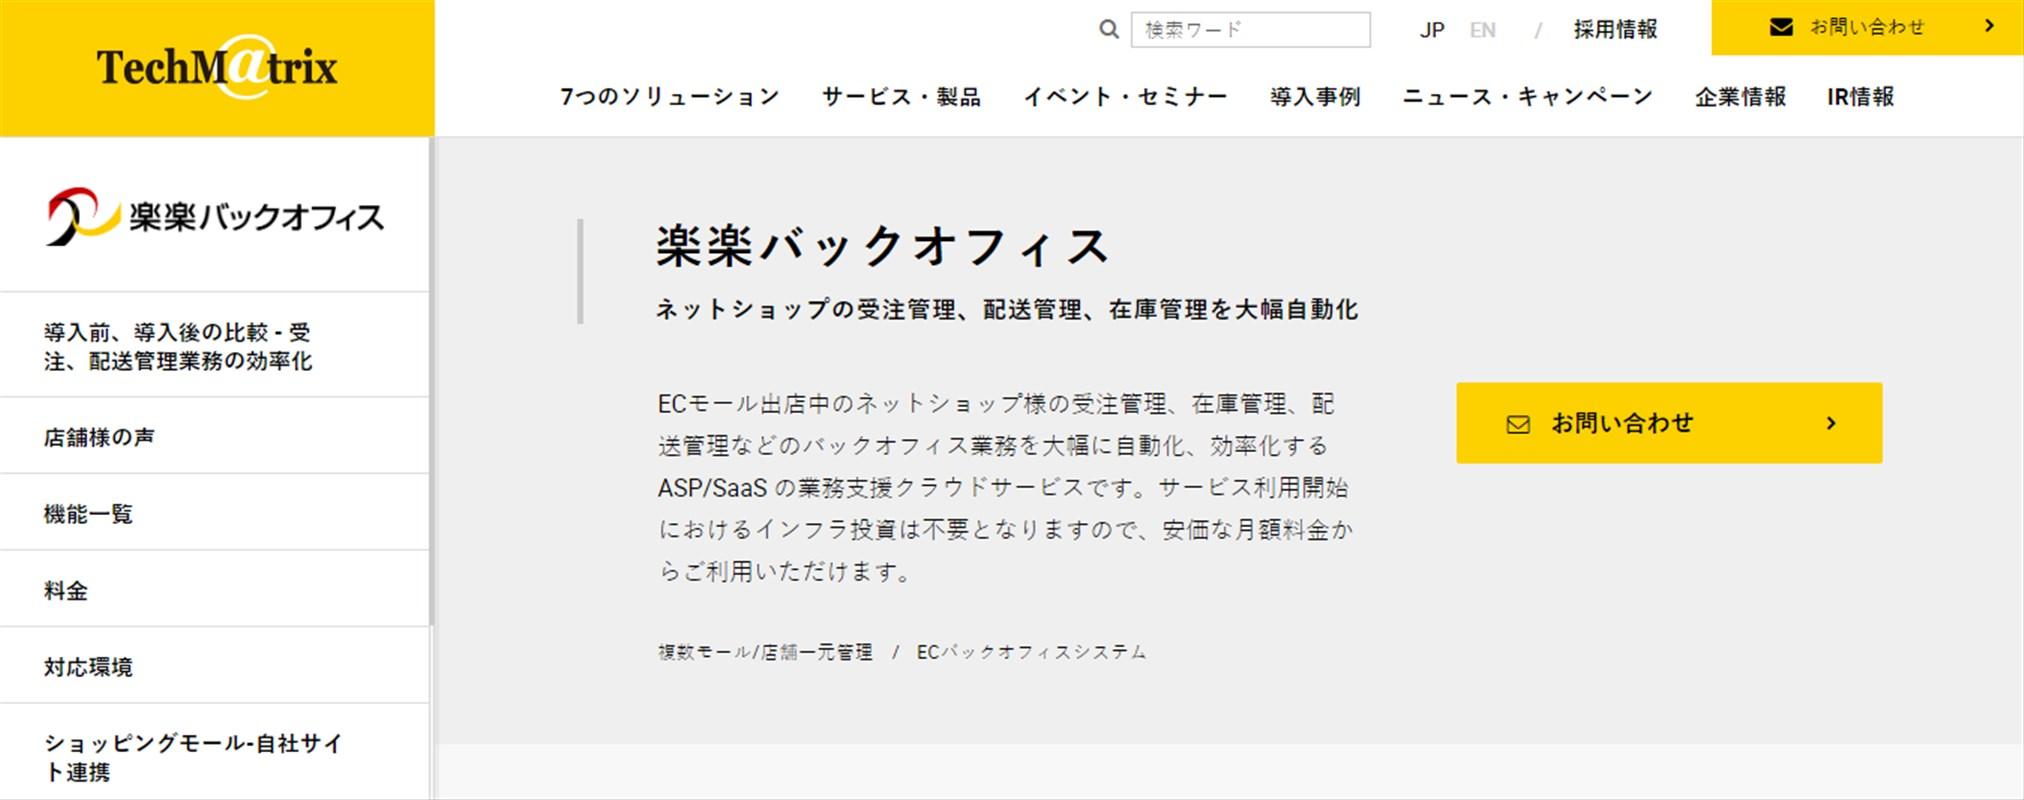 2019-03-29_10h46_12